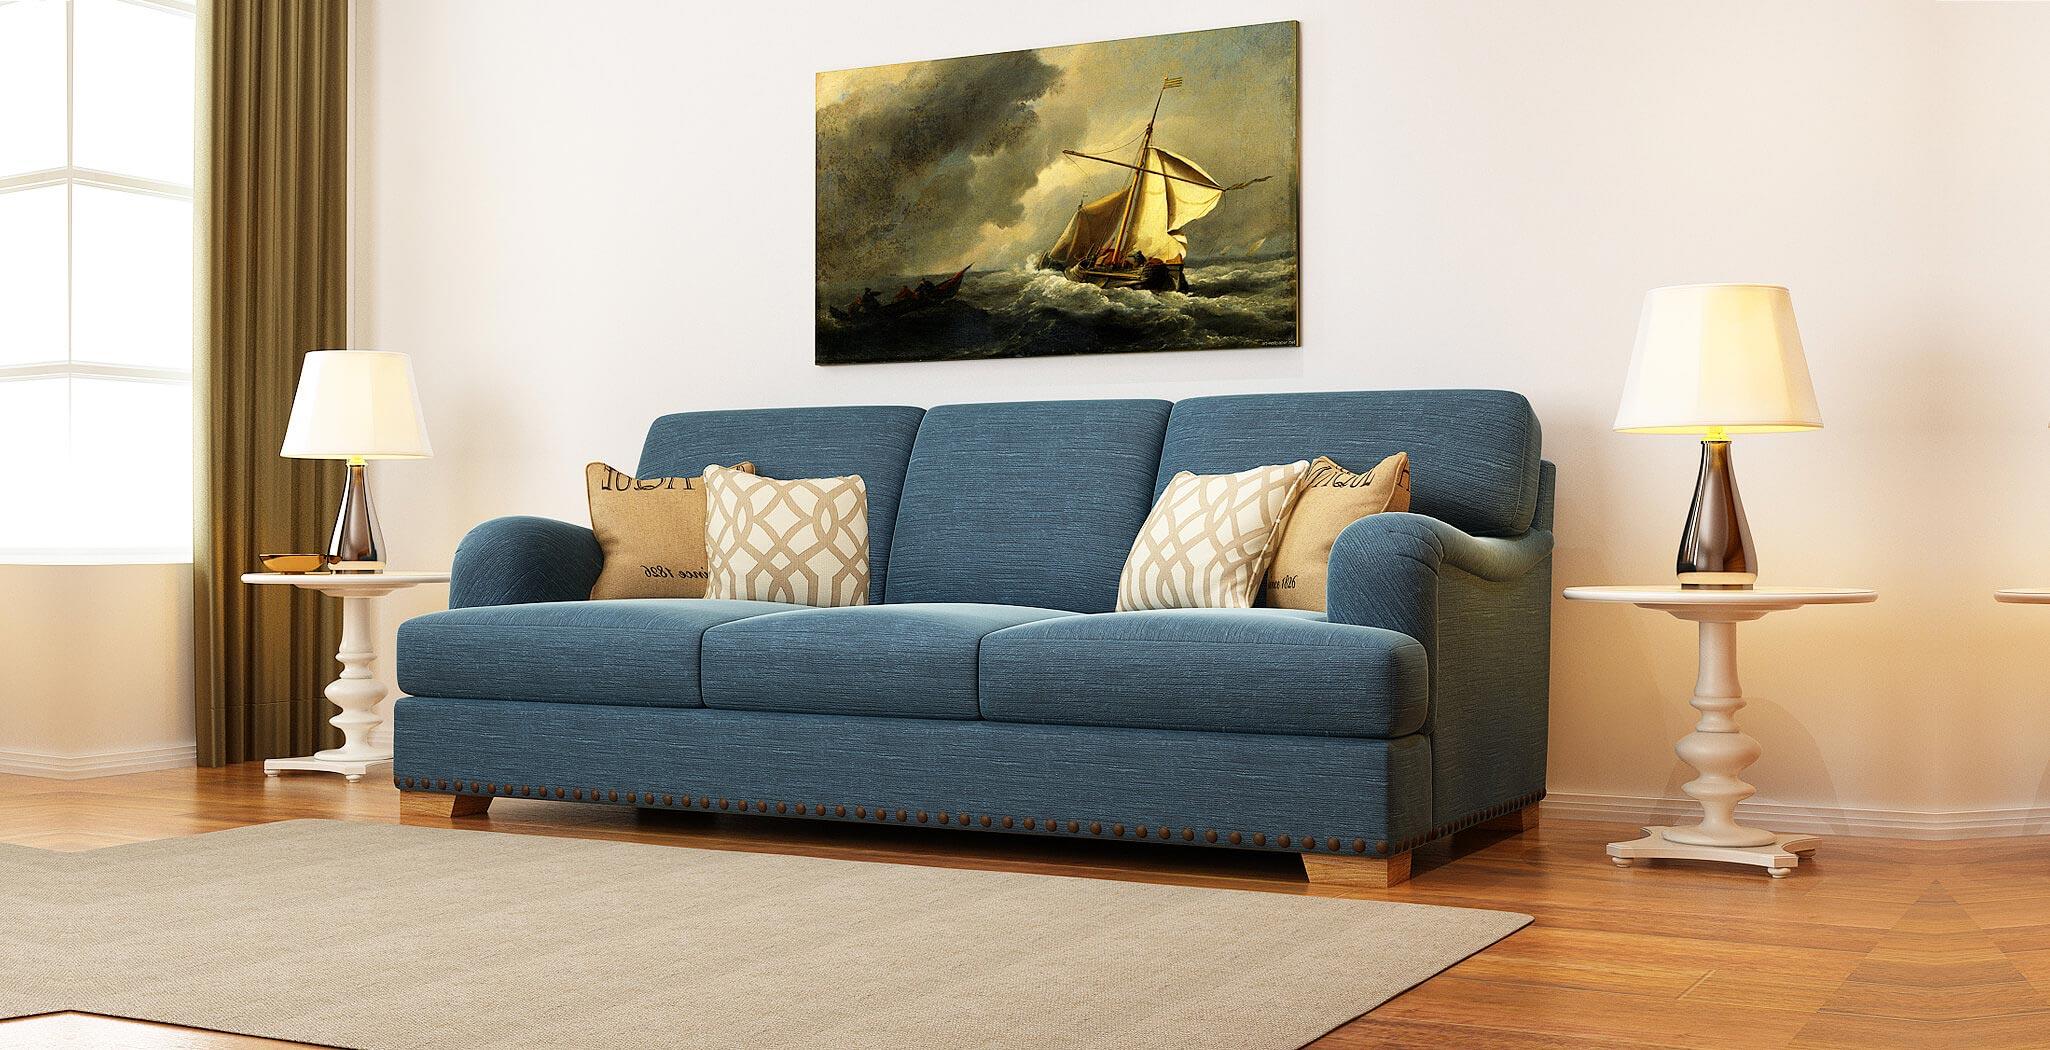 brighton sofa furniture gallery 2